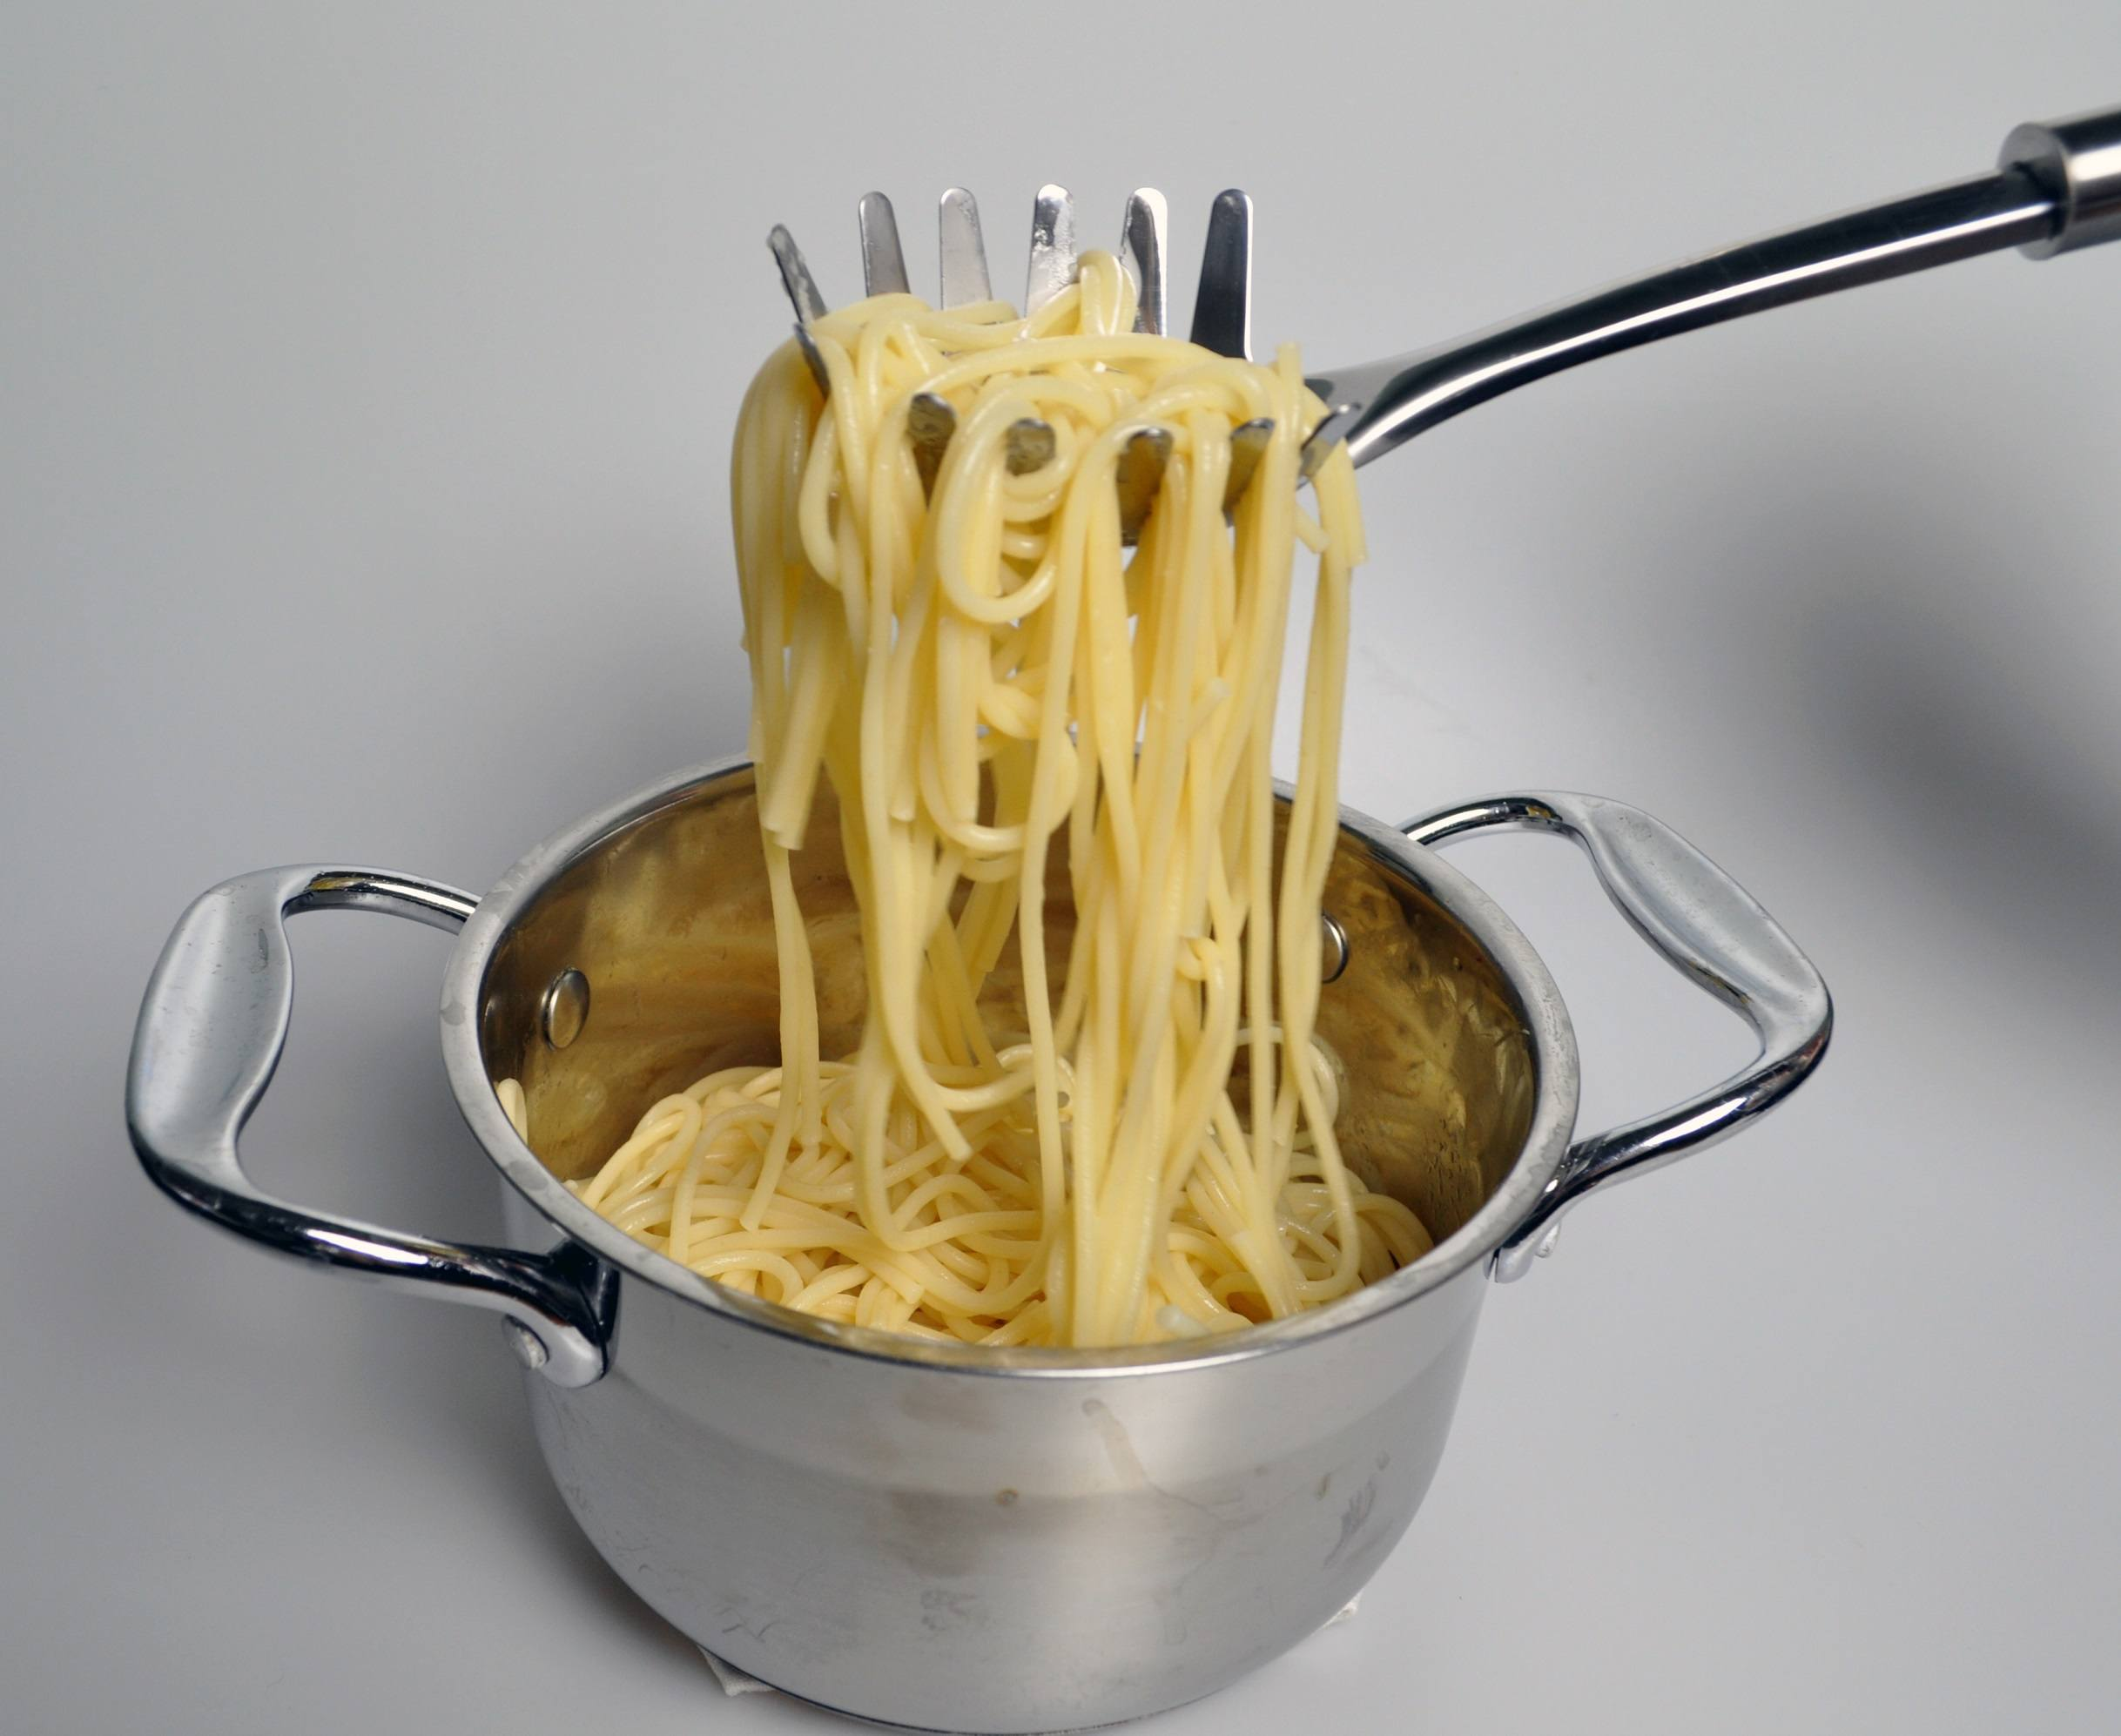 boiled spaghetti in a saucepan, in a spoon for spaghetti